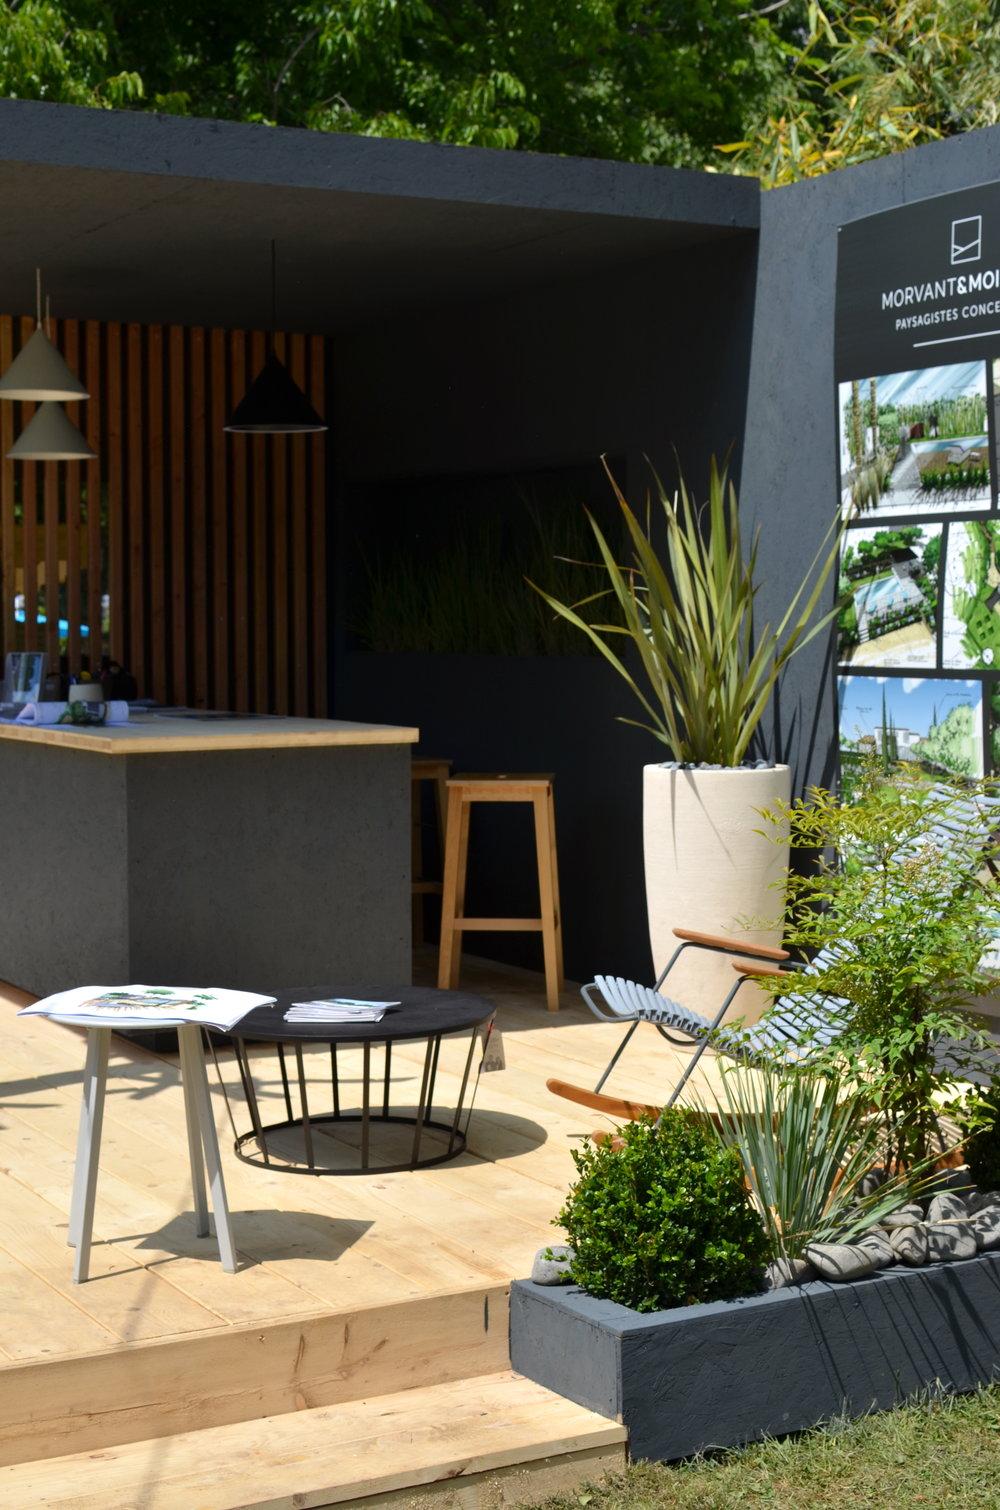 twinky lizzy blog aix en provence - cote sud 2017 30.jpg